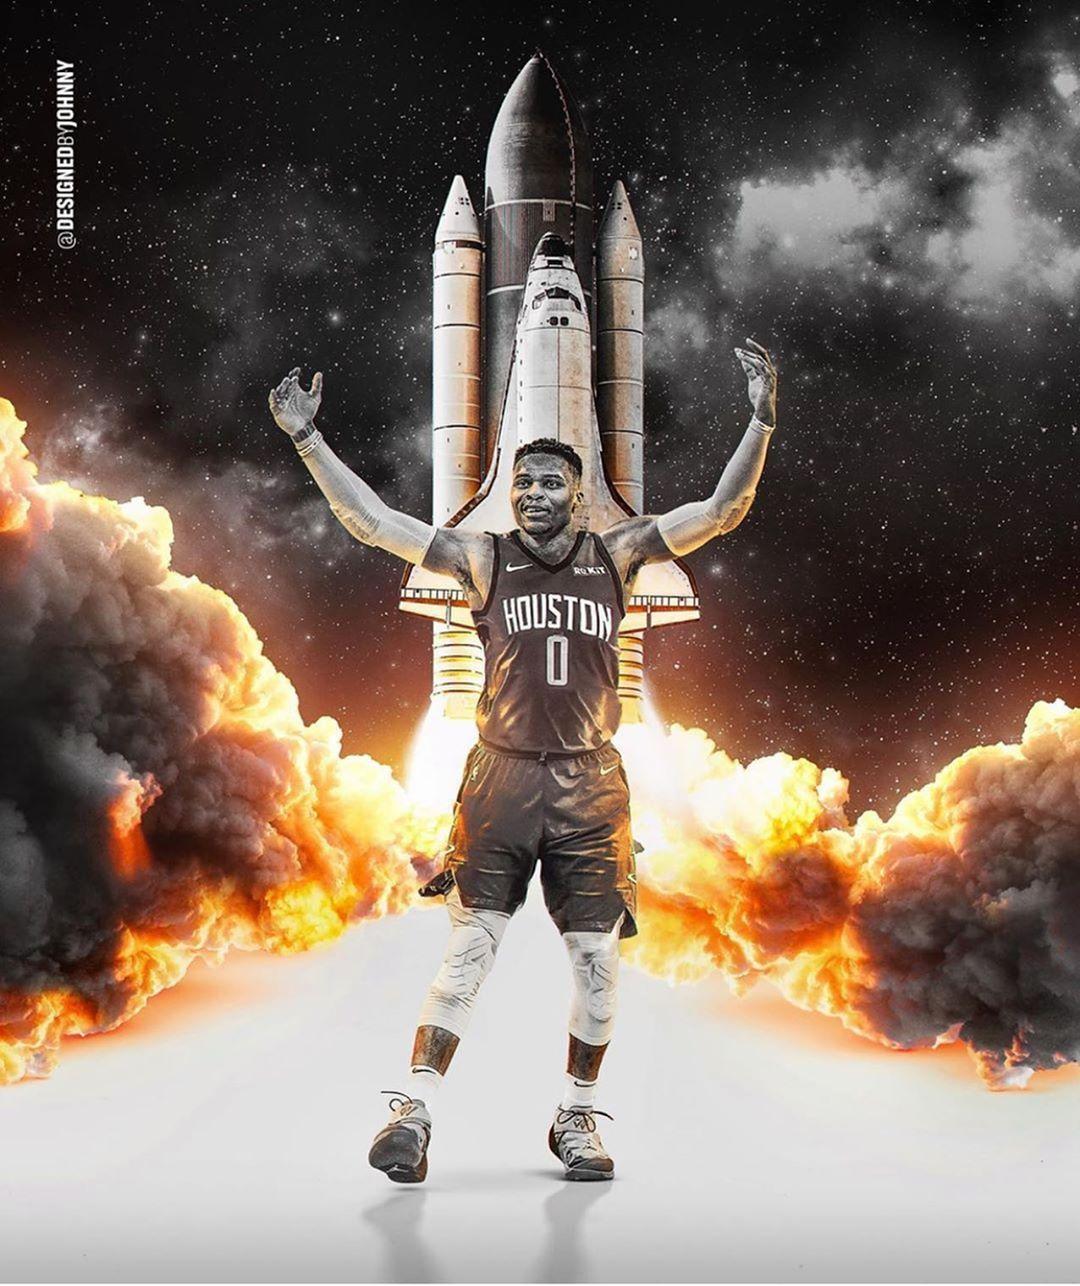 Houston Rockets This Week S Fanartfriday Featuring Russwest44 Keep Submitting Your Art Using Westbrook Wallpapers Houston Rockets Jordan Logo Wallpaper